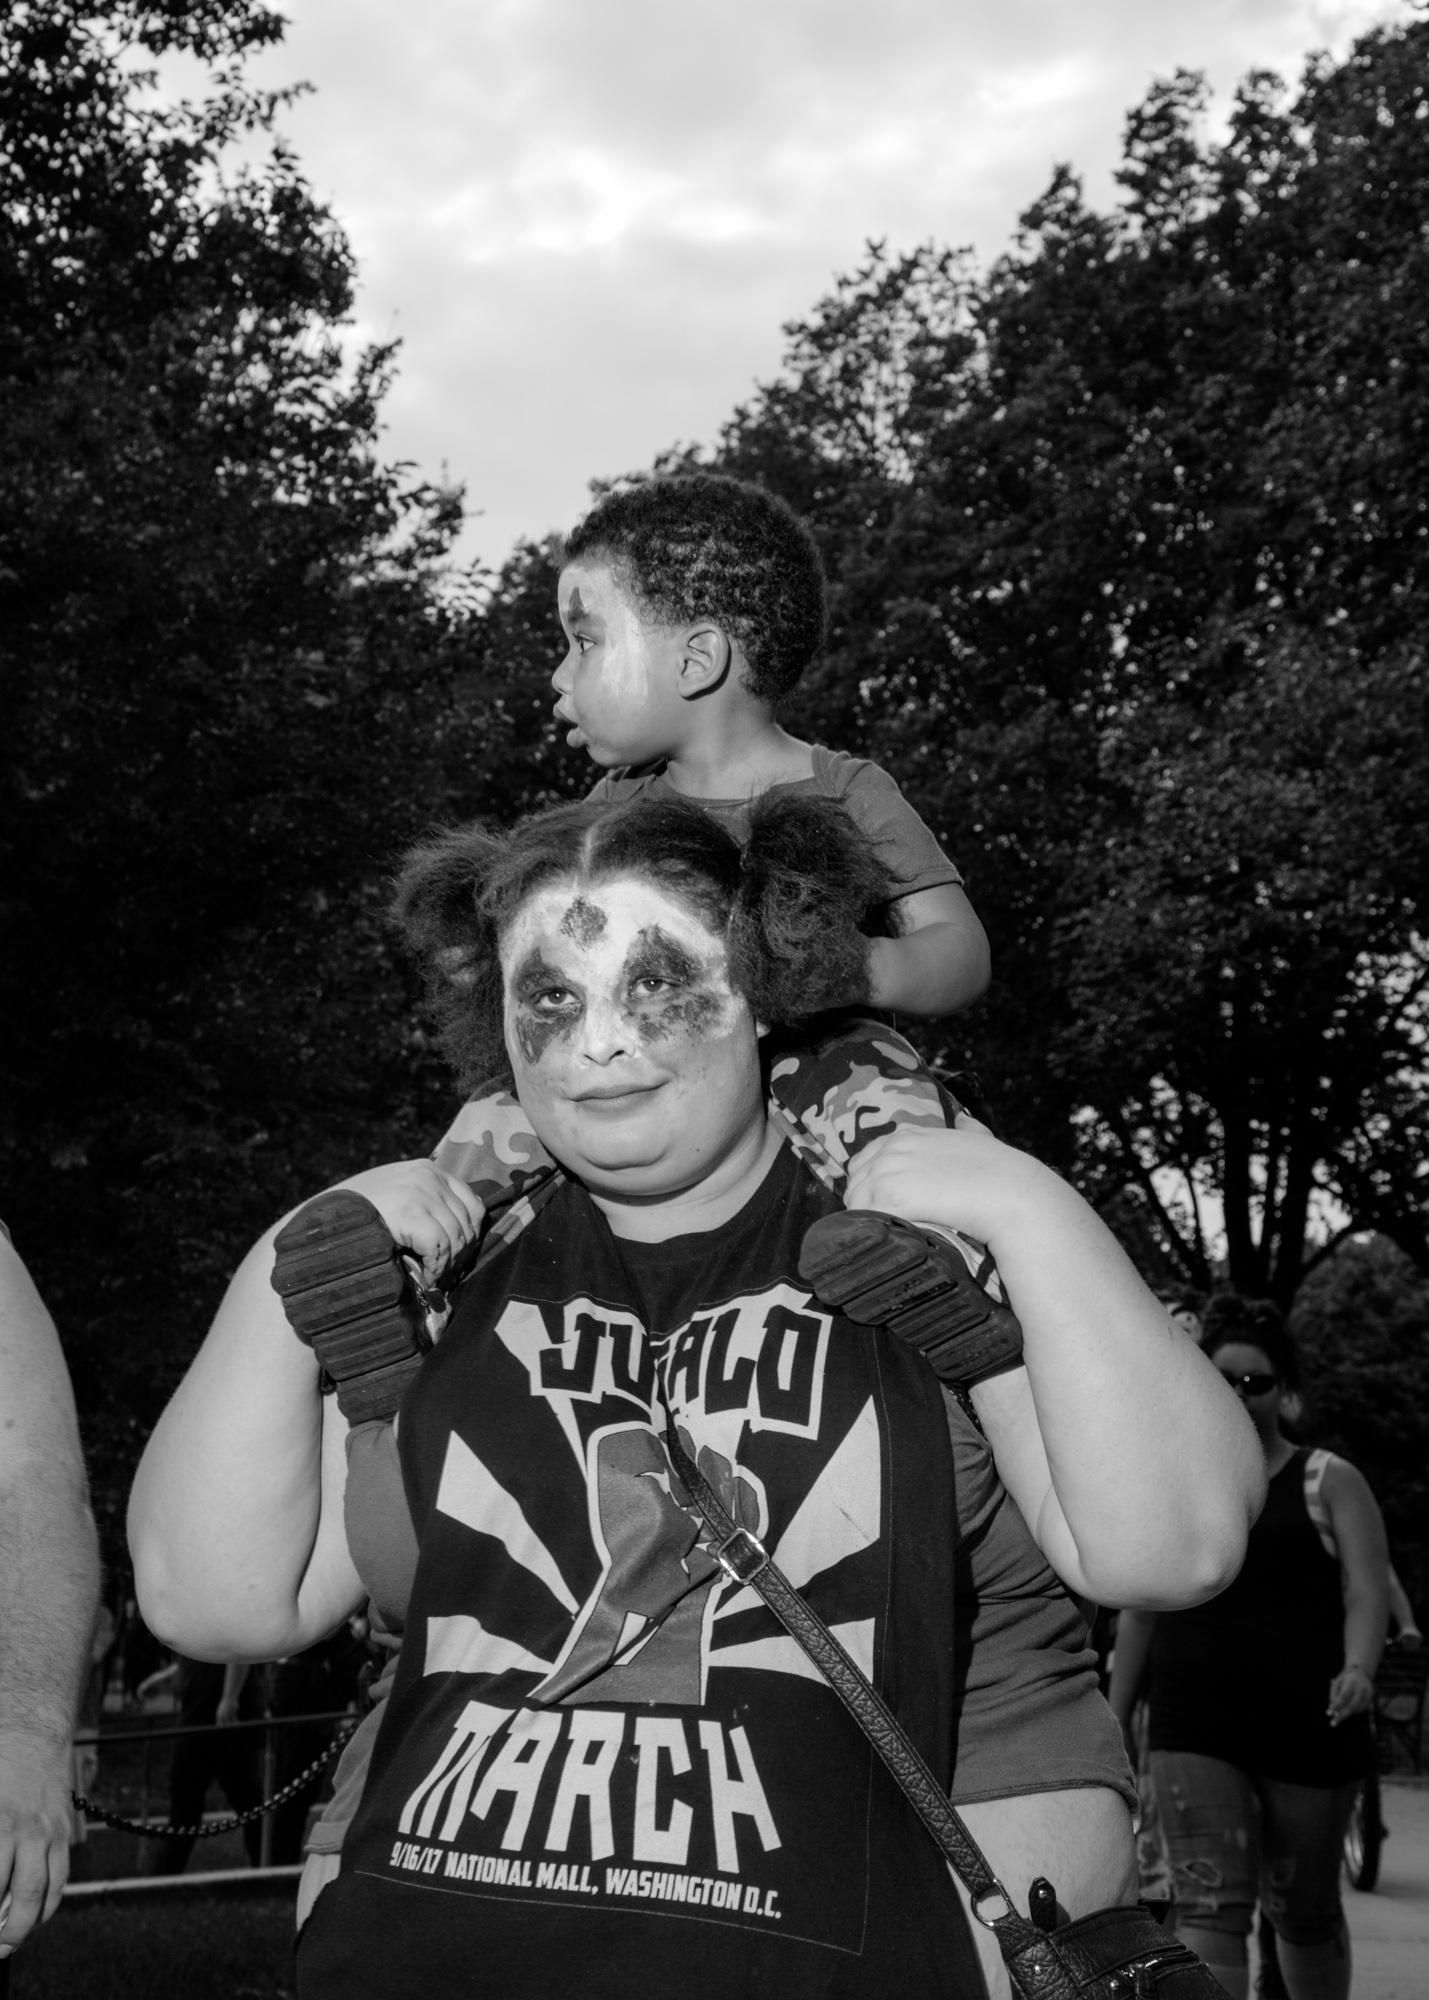 Juggalo March on Washington 2017_Photos by Daniel Terna-19.jpg